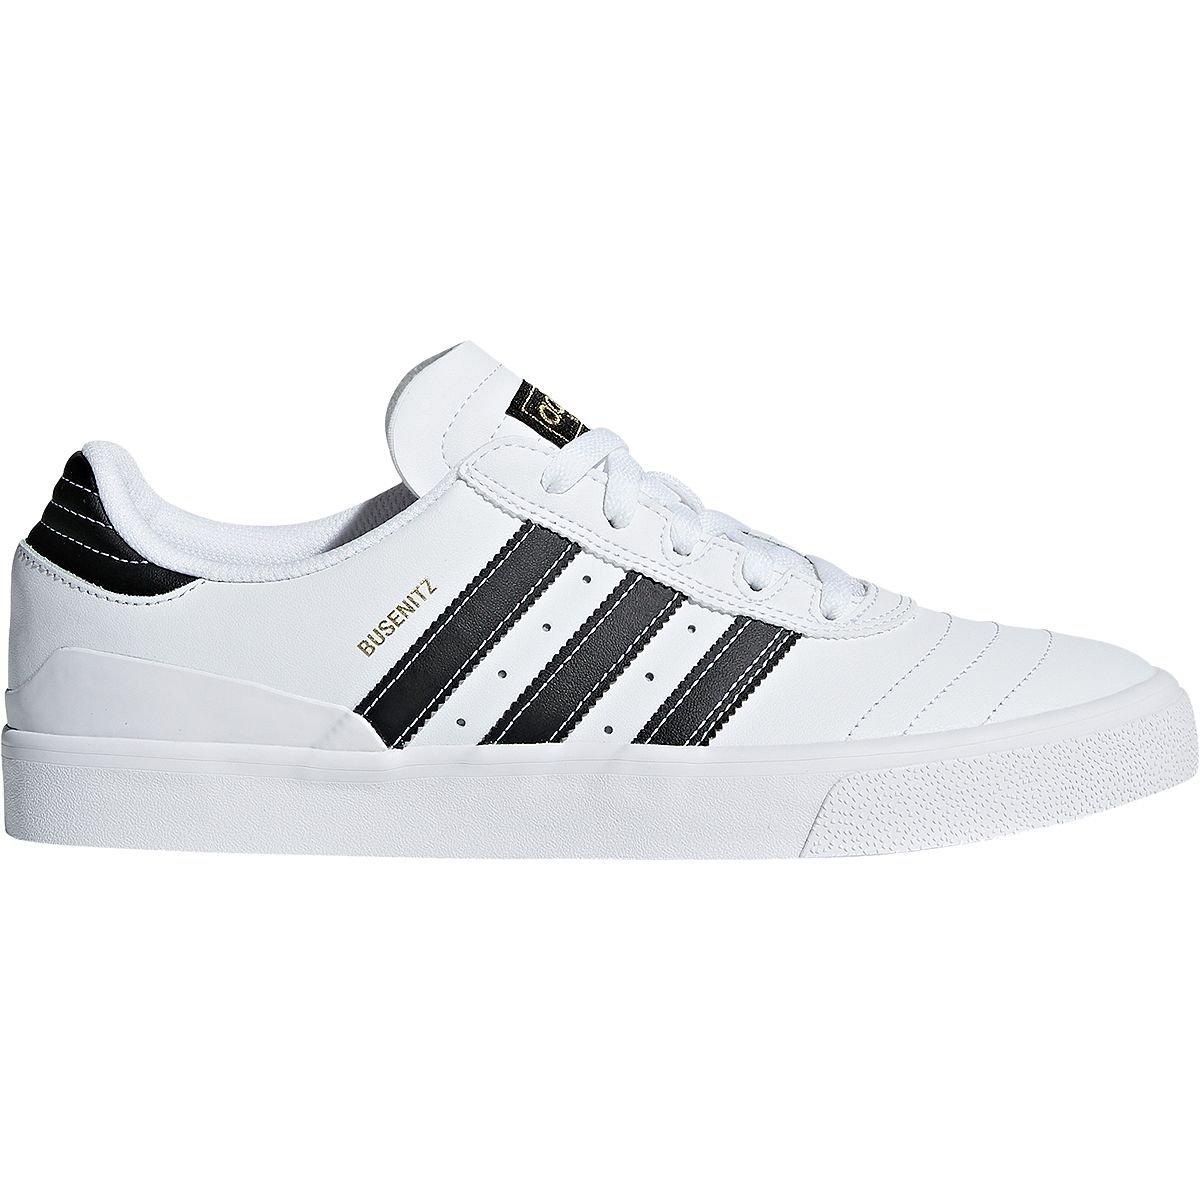 Men/Women Adidas Men's Skateboarding The Busenitz Sneaker Sneaker Sneaker durable low cost Current shape ae1f24